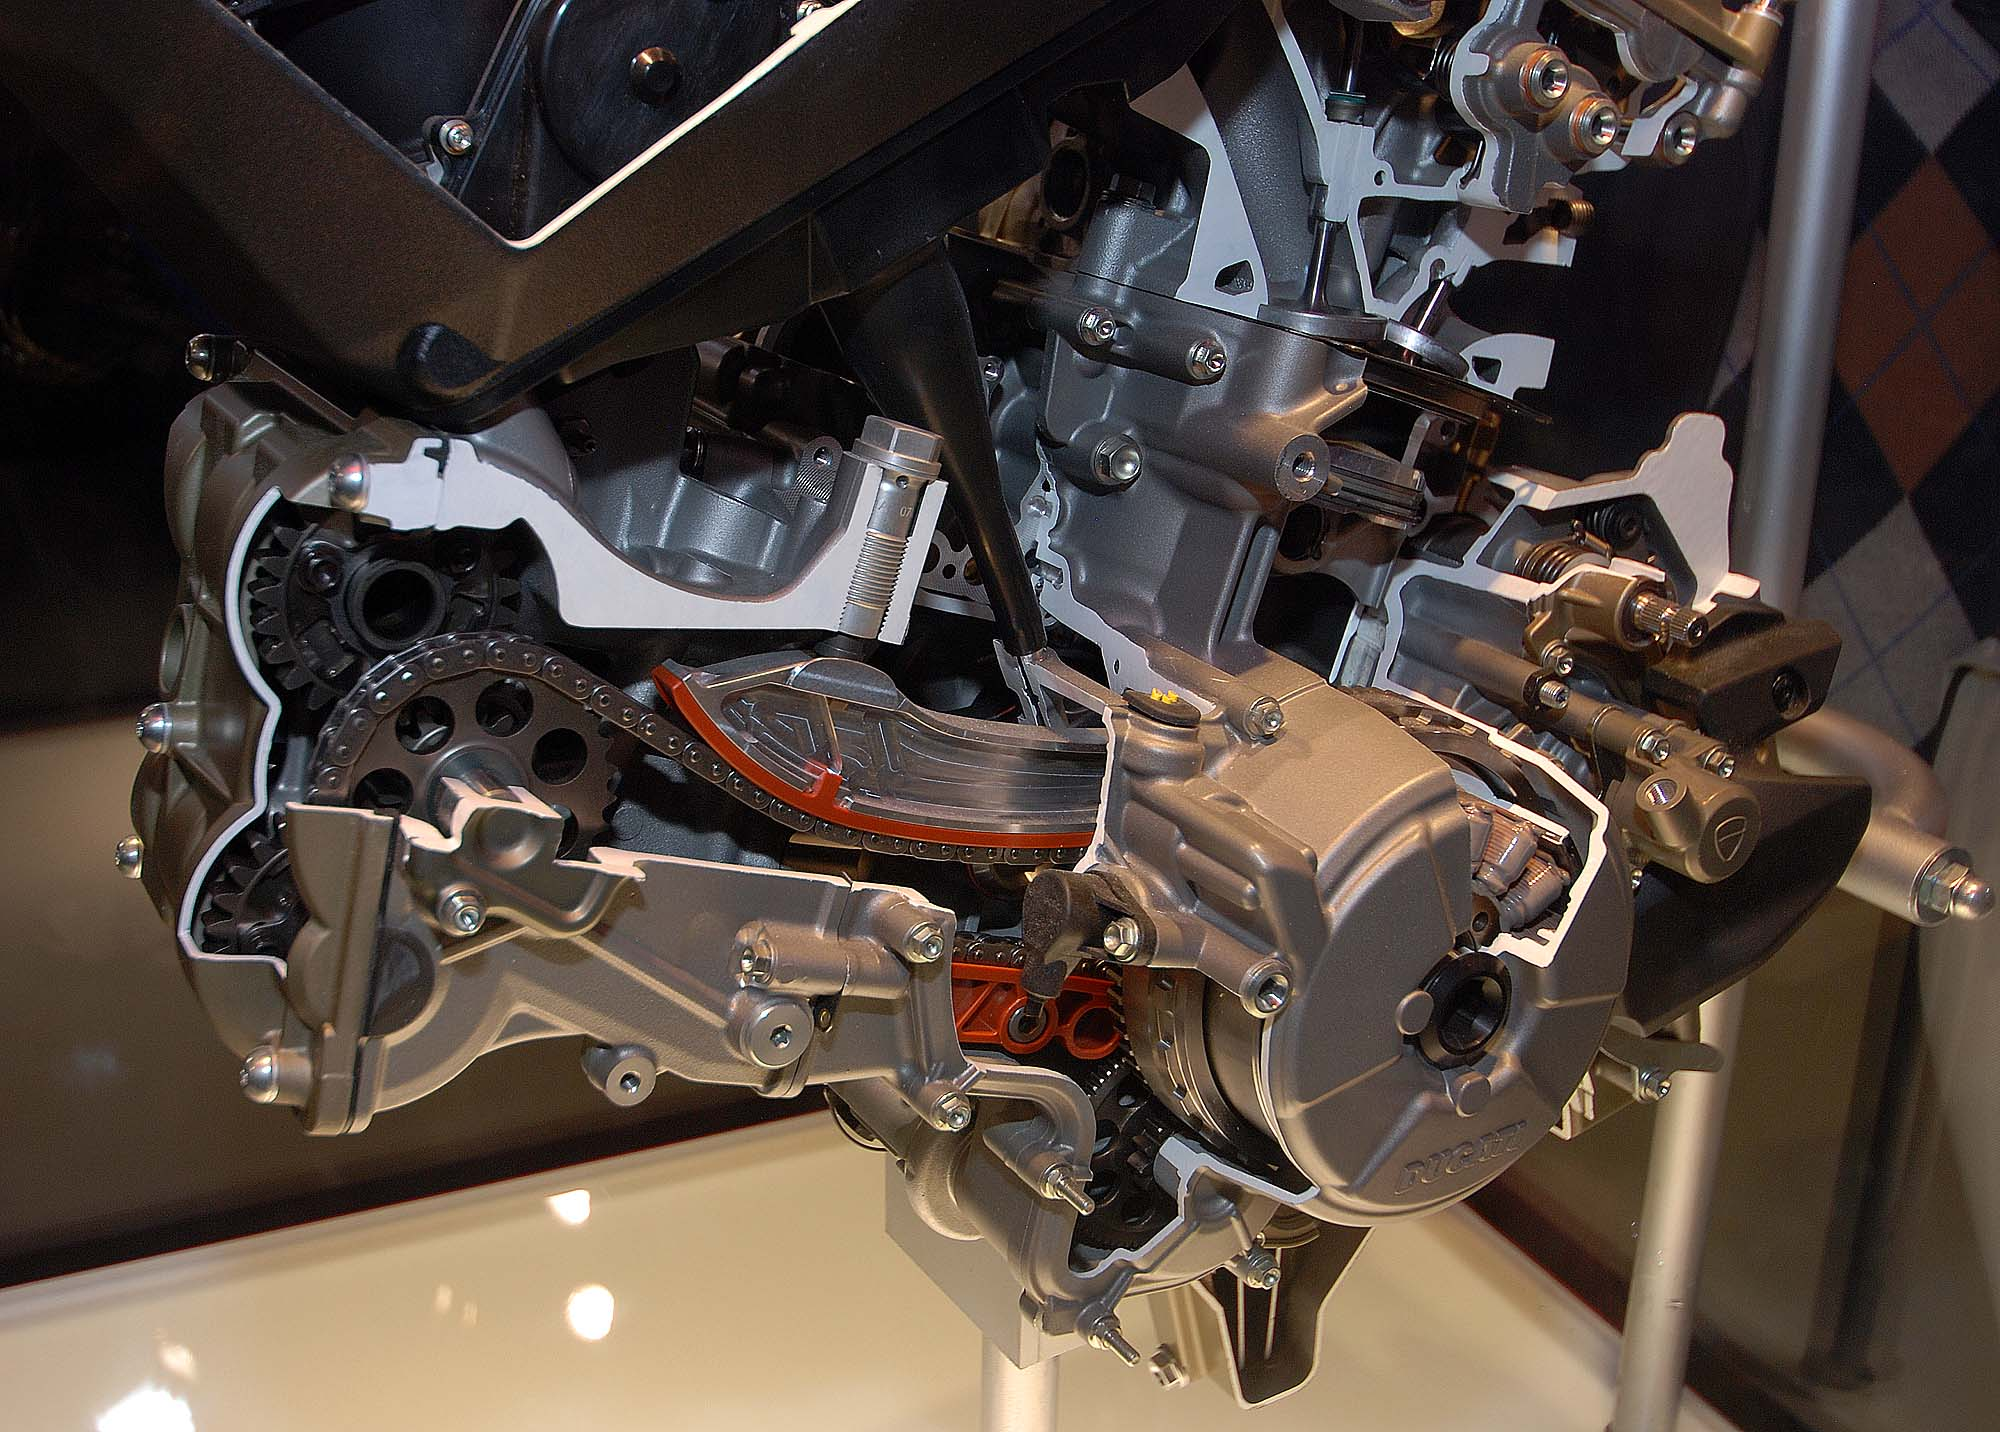 Cutaway Photos Of The Ducati Superquadro Engine Asphalt